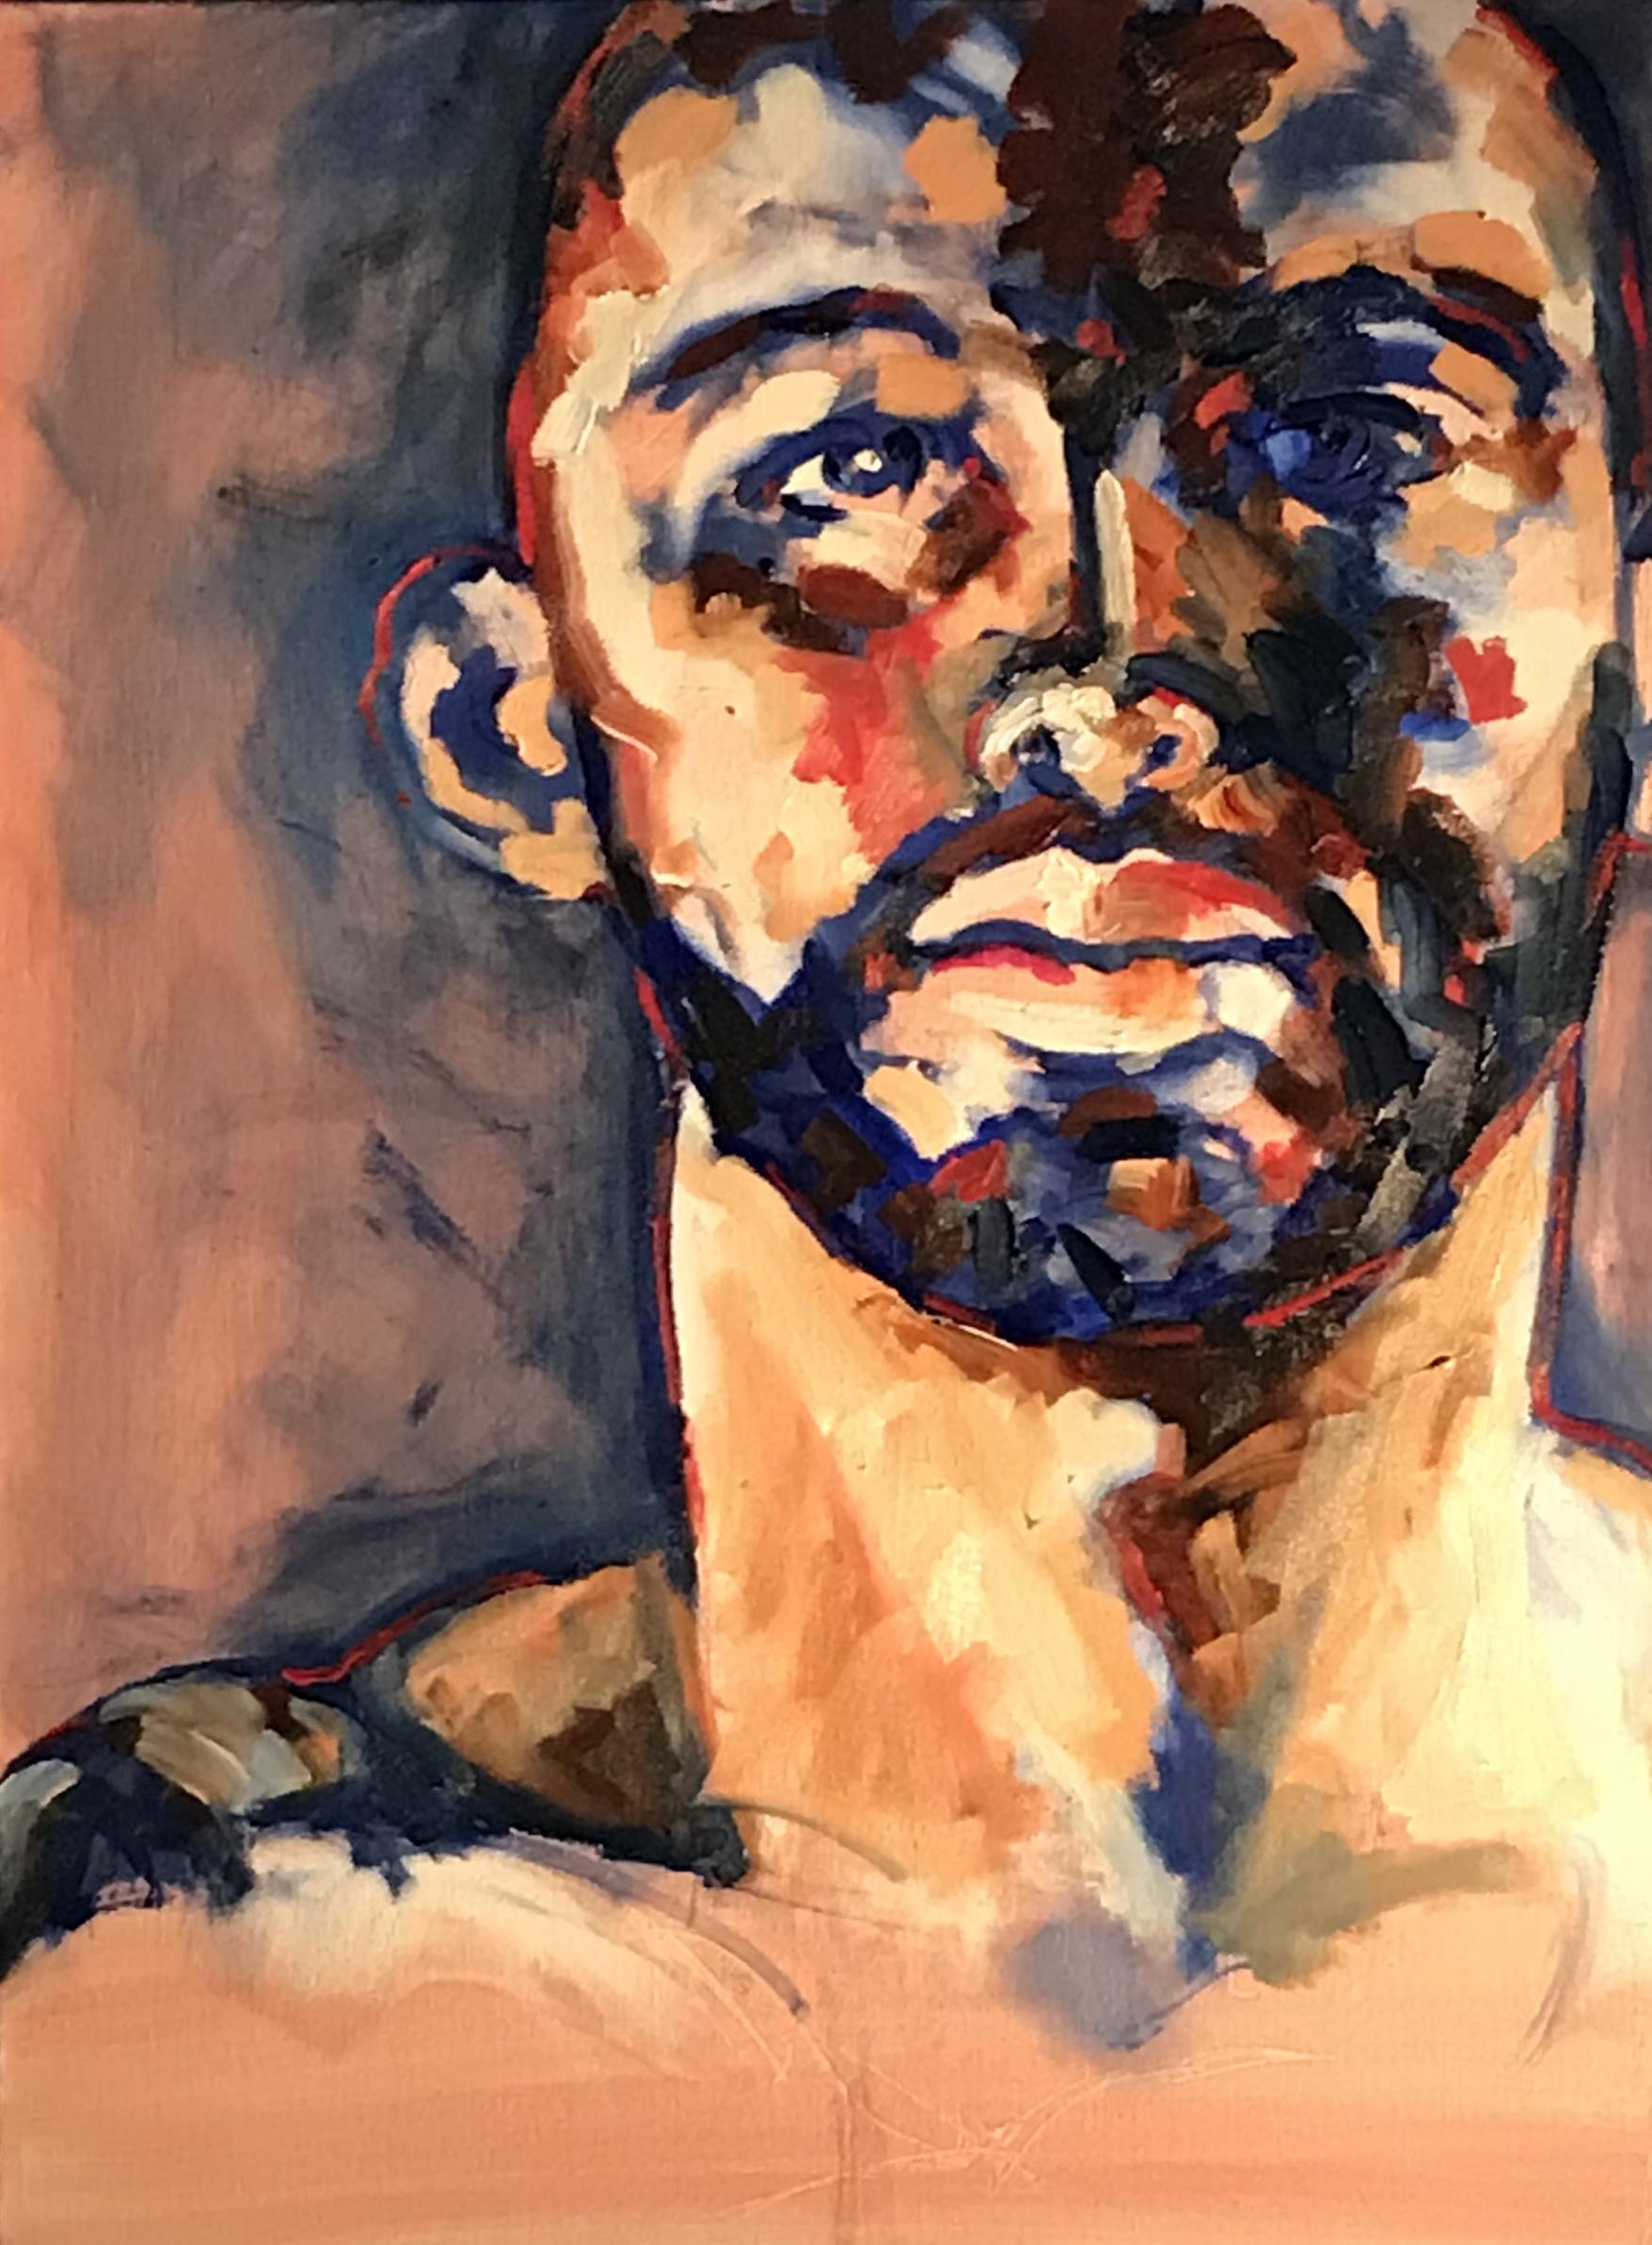 Simon Oil On Canvas 16x20  $800